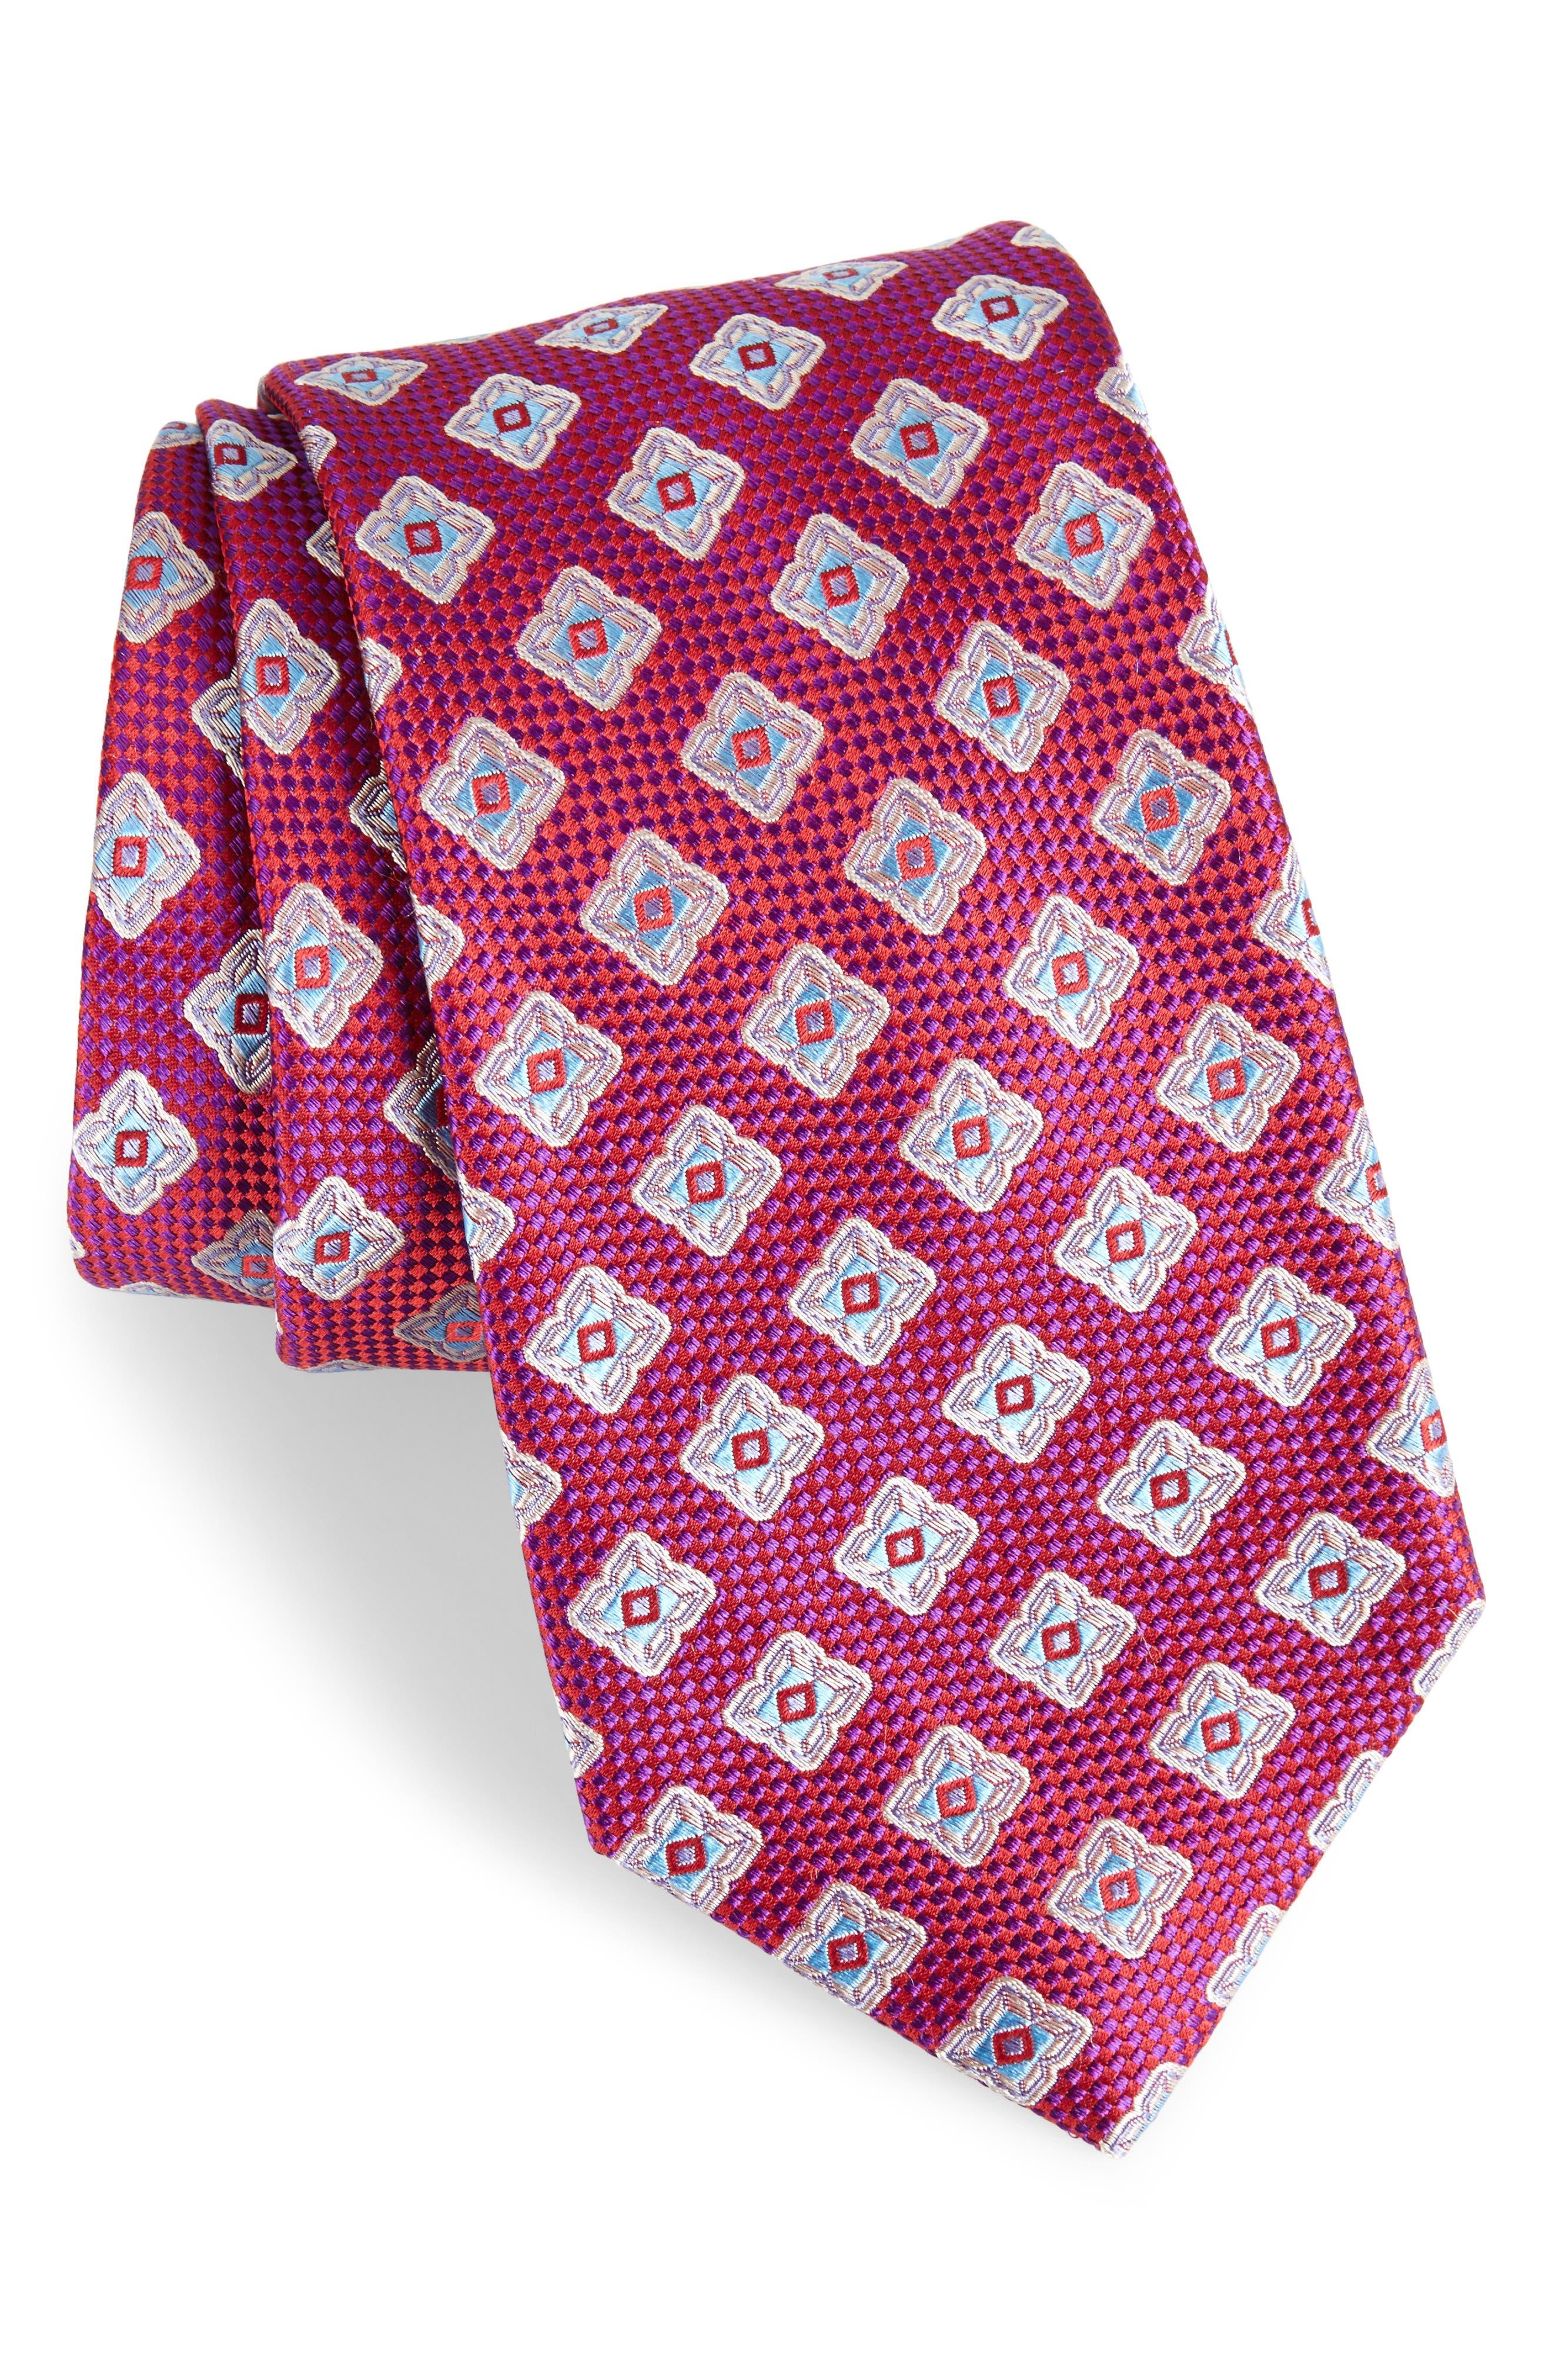 Nordstrom Men's Shop Ethan Medallion Silk Tie